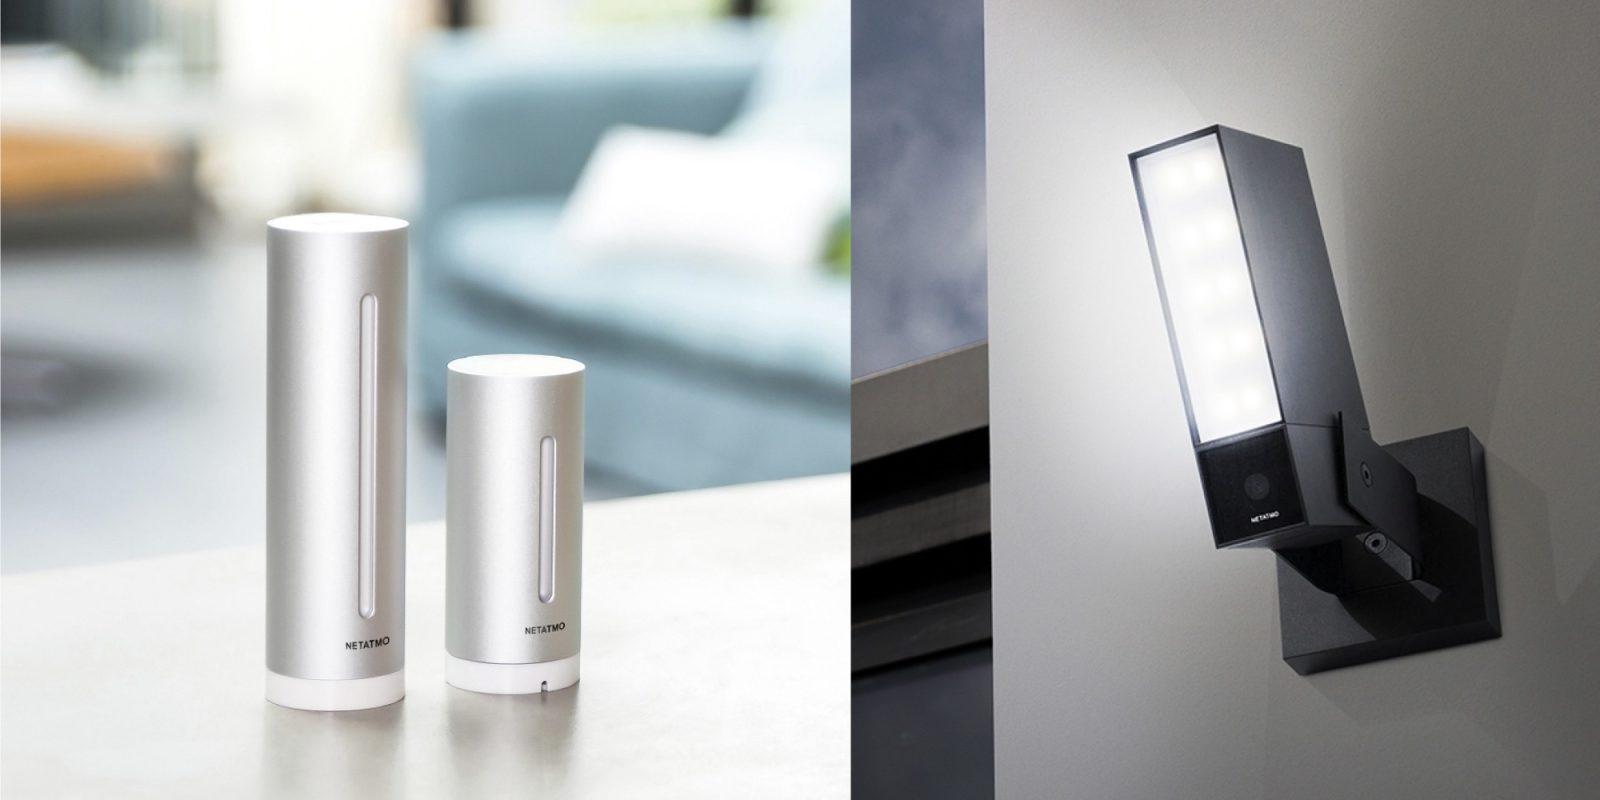 Netatmo's HomeKit Presence Camera hits $225 (Reg. $300), more deals from $52